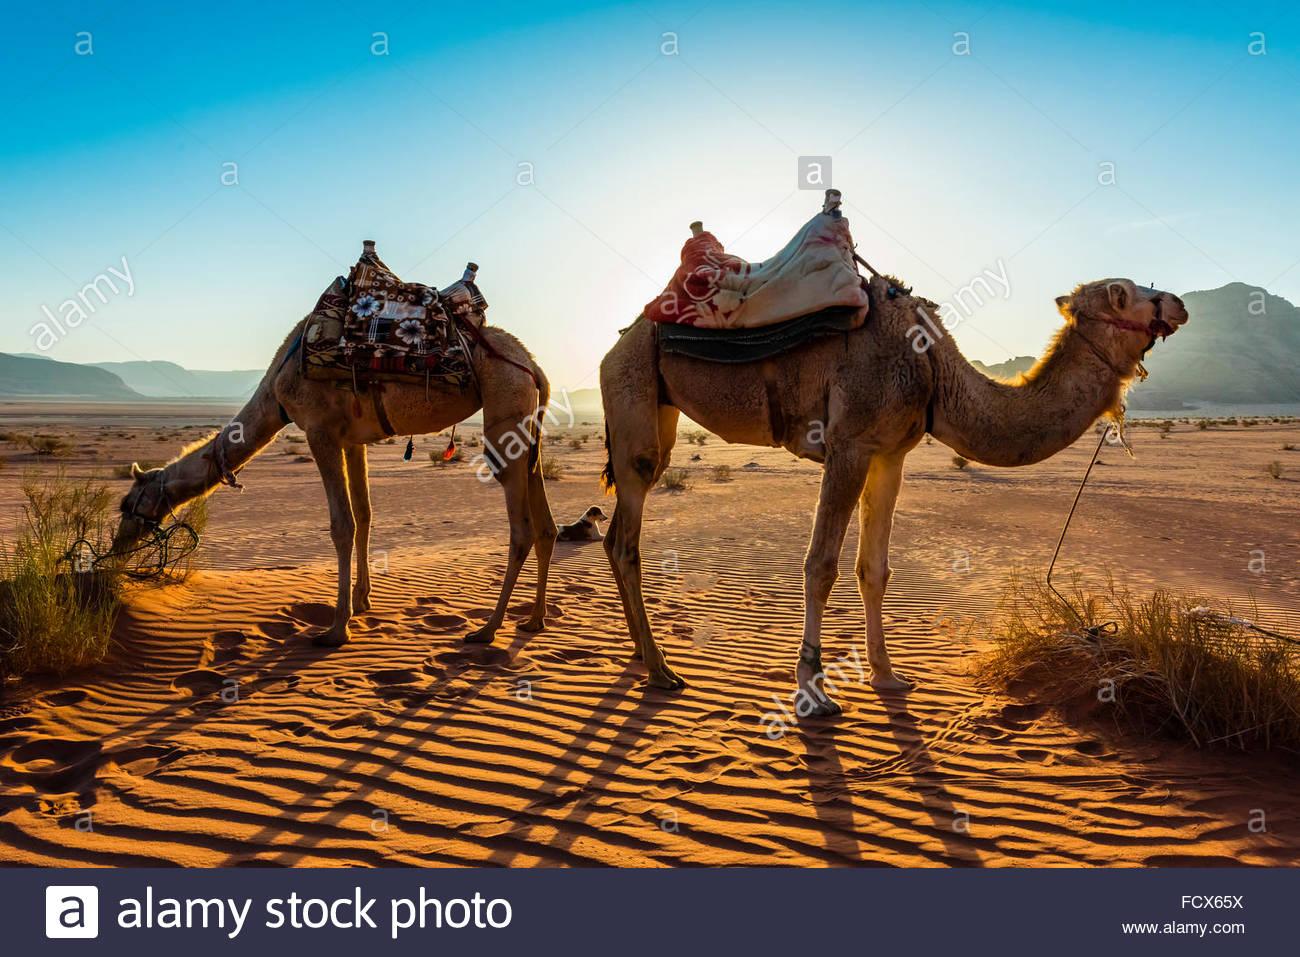 Kamele, Arabische Wüste, Wadi Rum, Jordanien. Stockfoto